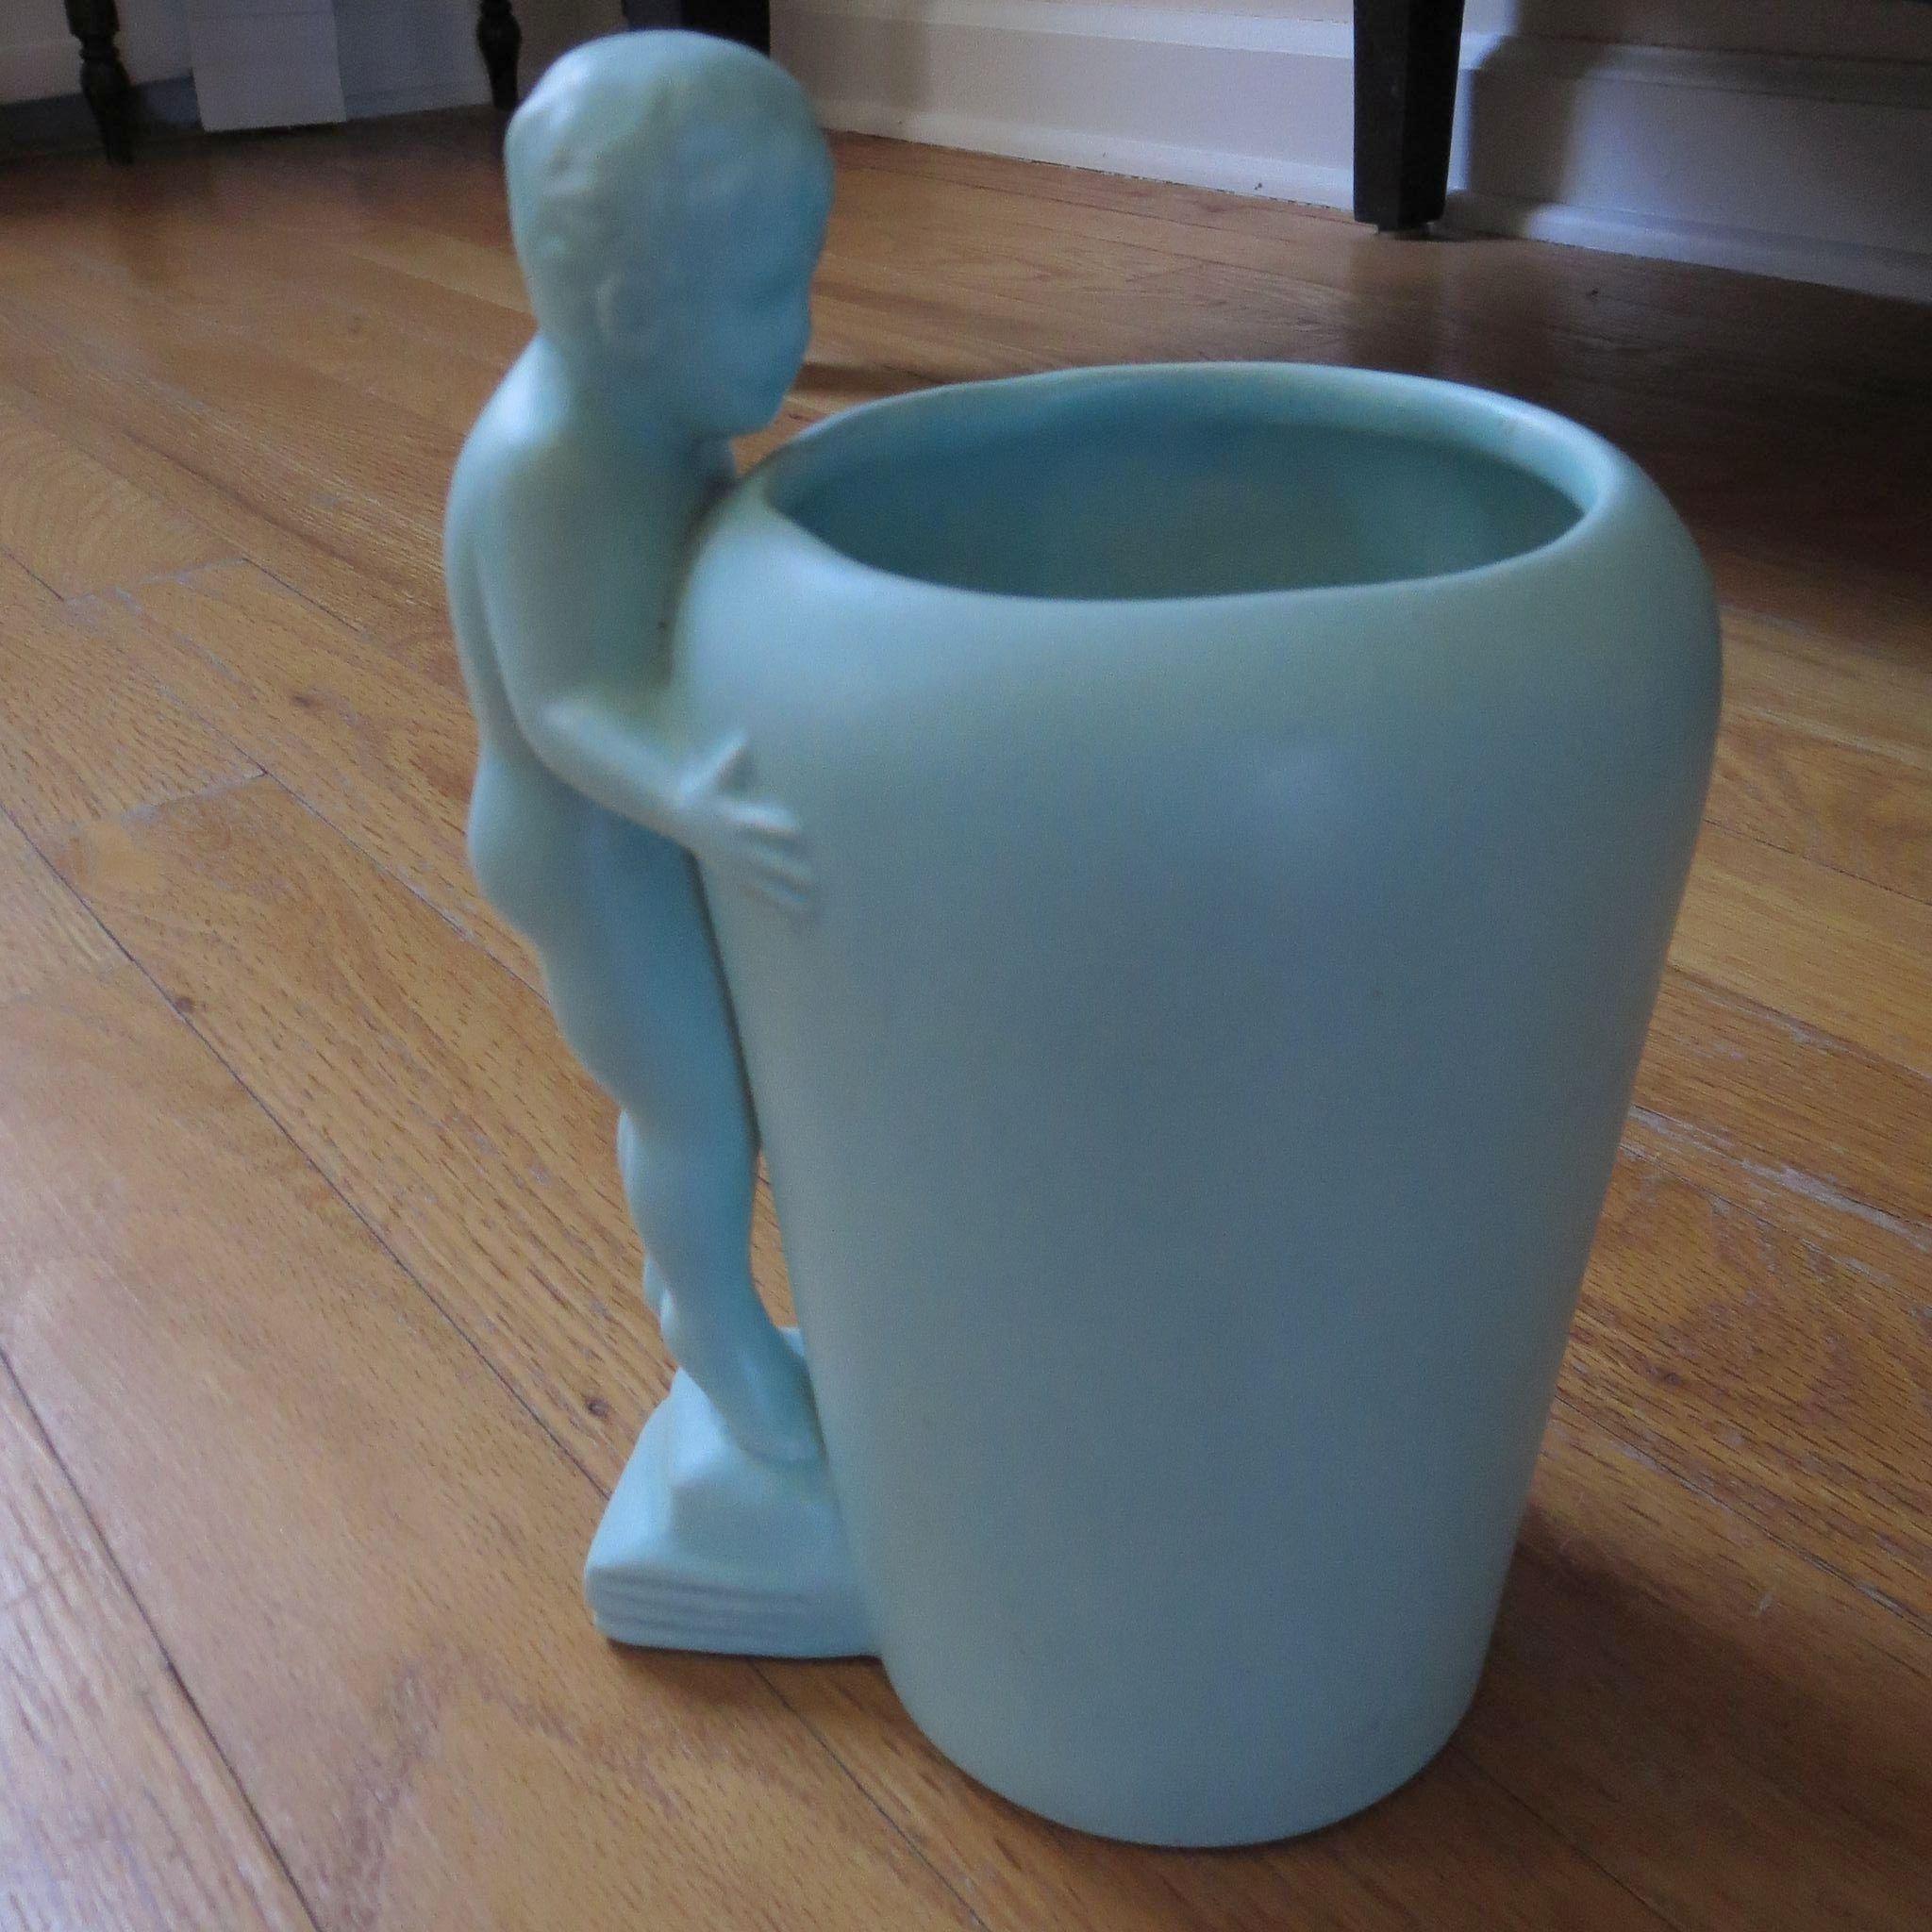 Haeger Aqua Pottery Vase - Cherub Nude Peeking Over Top